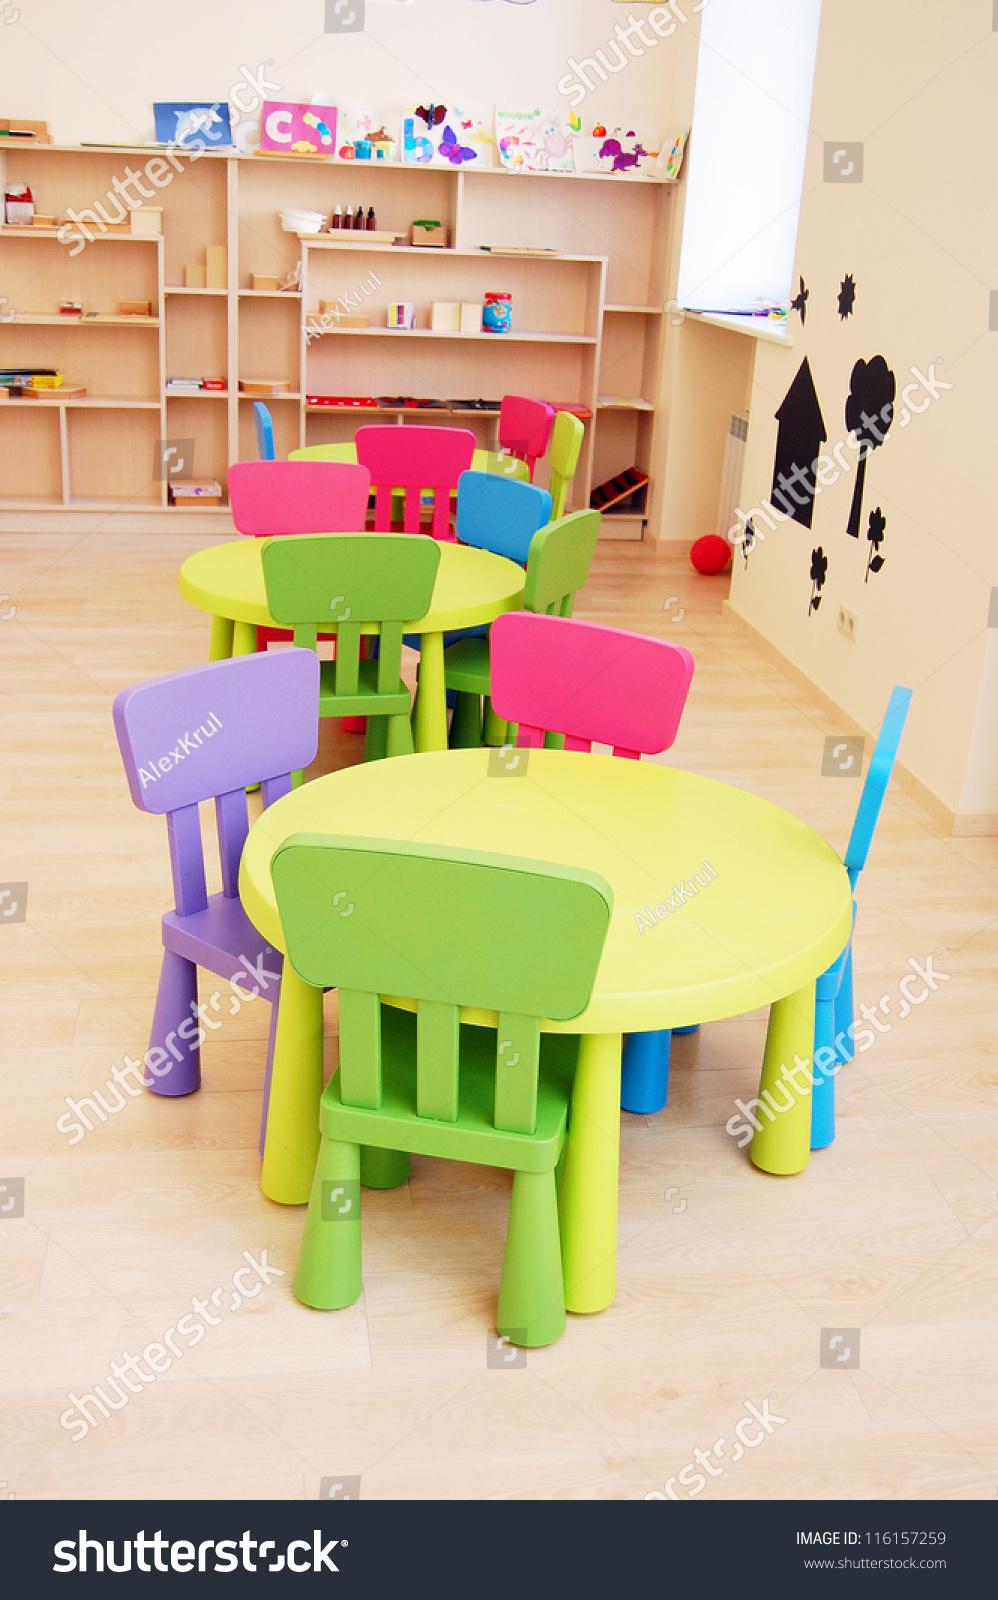 Kindergarten classroom table - Montessori Kindergarten Preschool Classroom With Table And Chairs